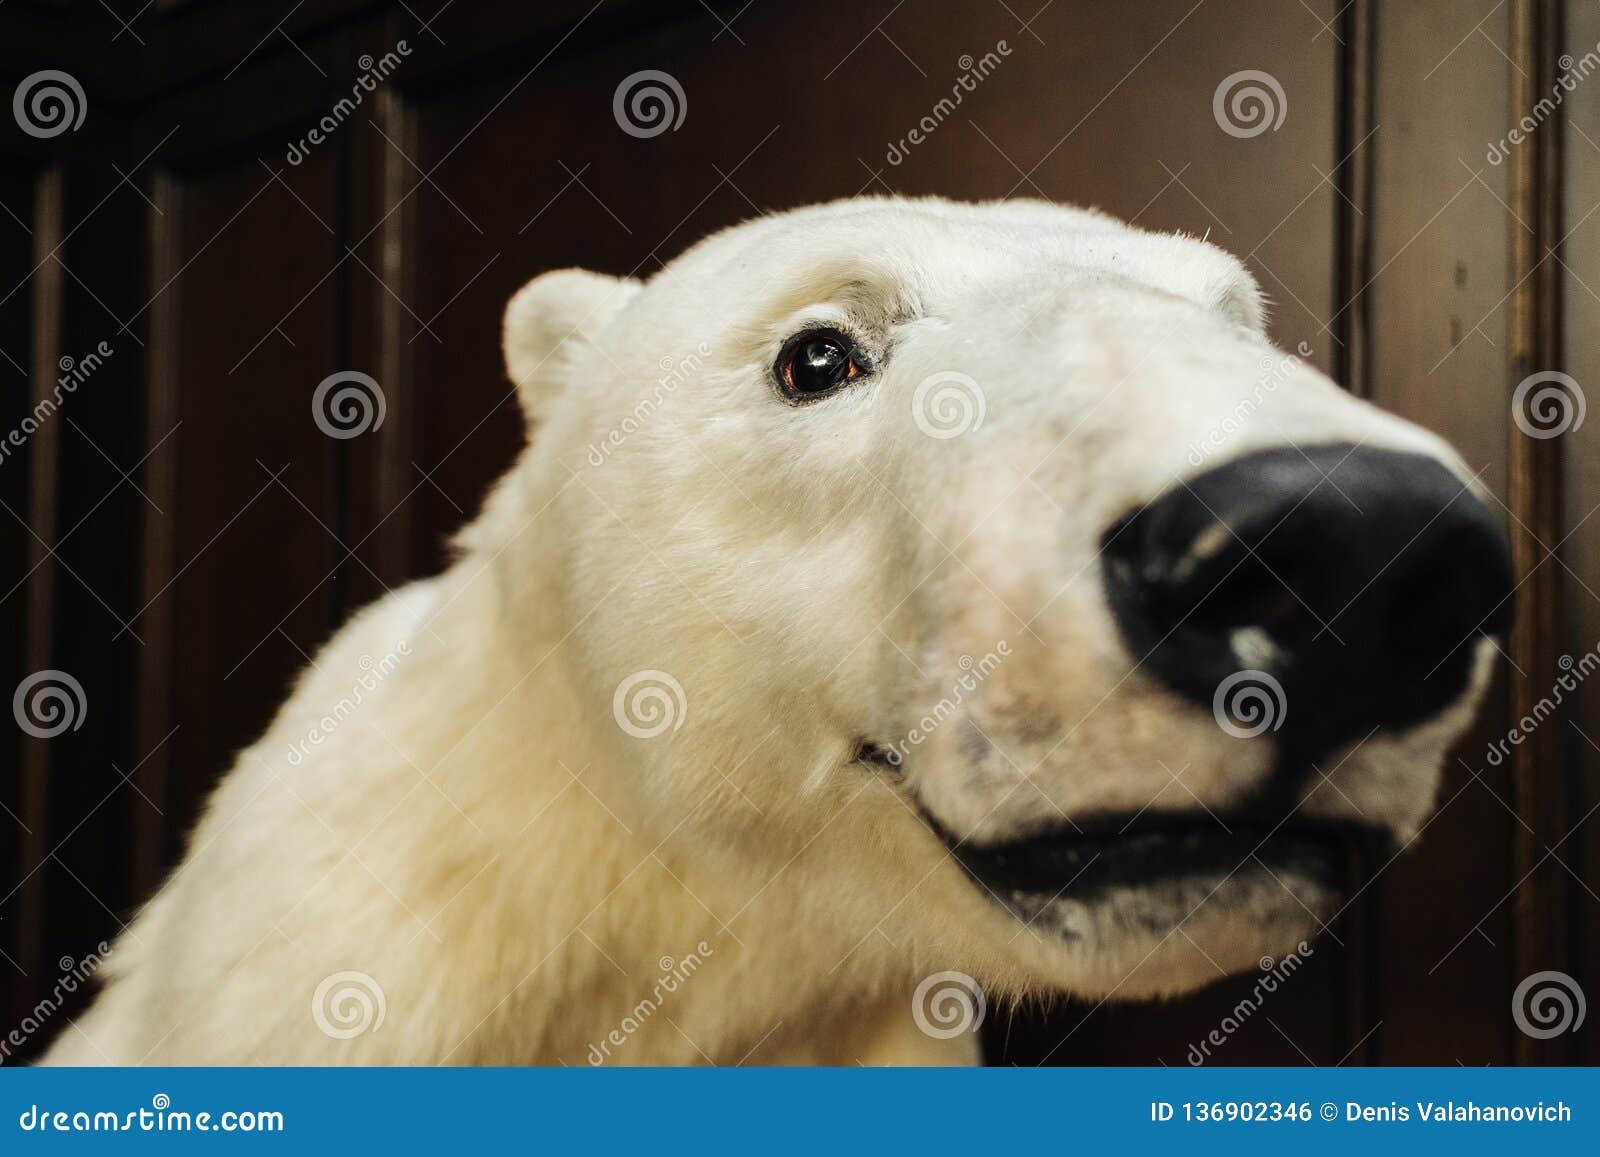 Großer weißer Bär betrachtet Kamera